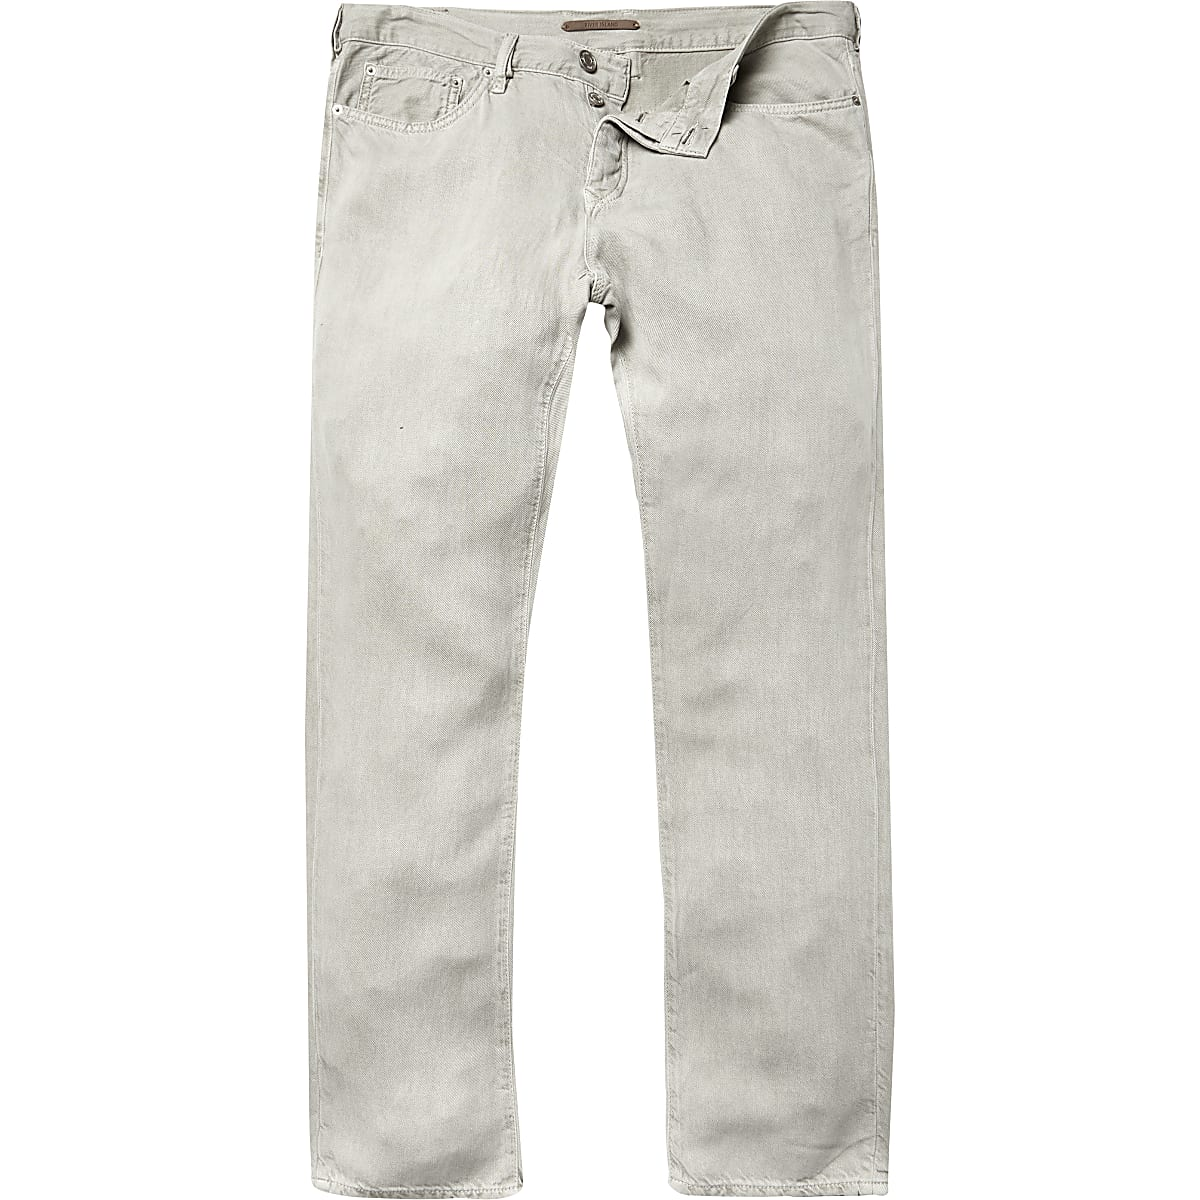 Light khaki linen-blend trousers